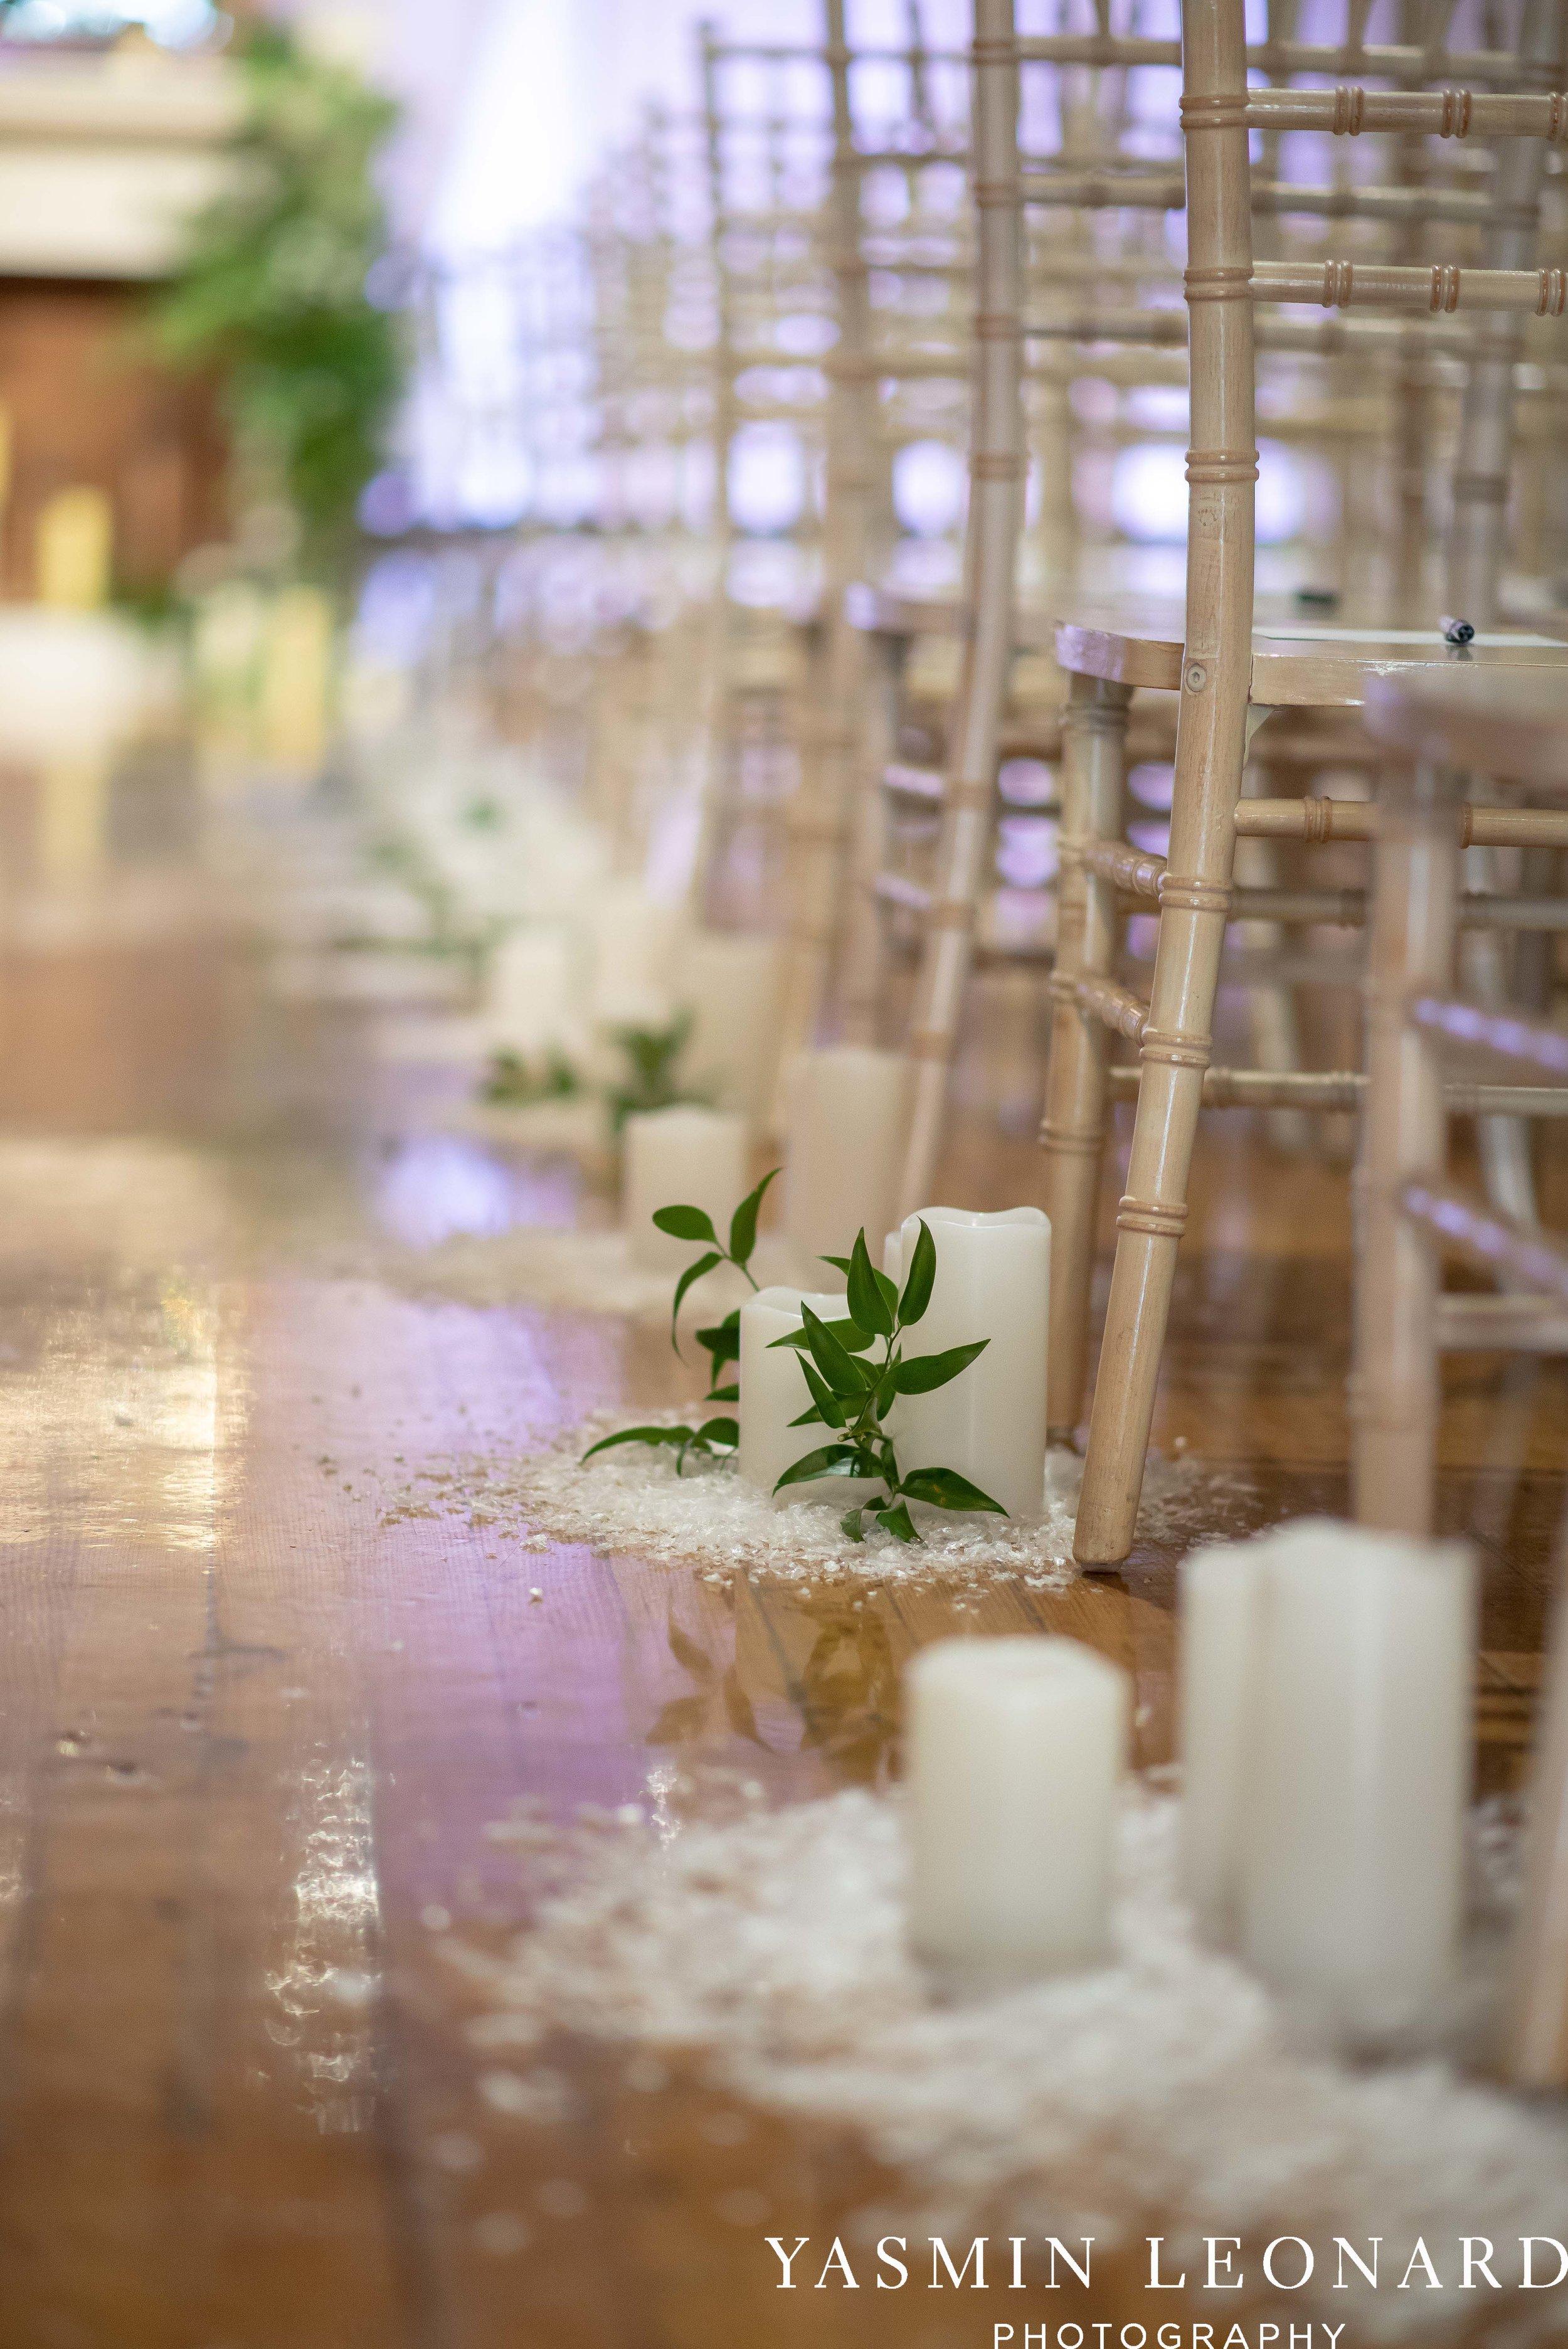 Rebekah and Matt - 105 Worth Event Centre - Yasmin Leonard Photography - Asheboro Wedding - NC Wedding - High Point Weddings - Triad Weddings - Winter Wedding-2.jpg